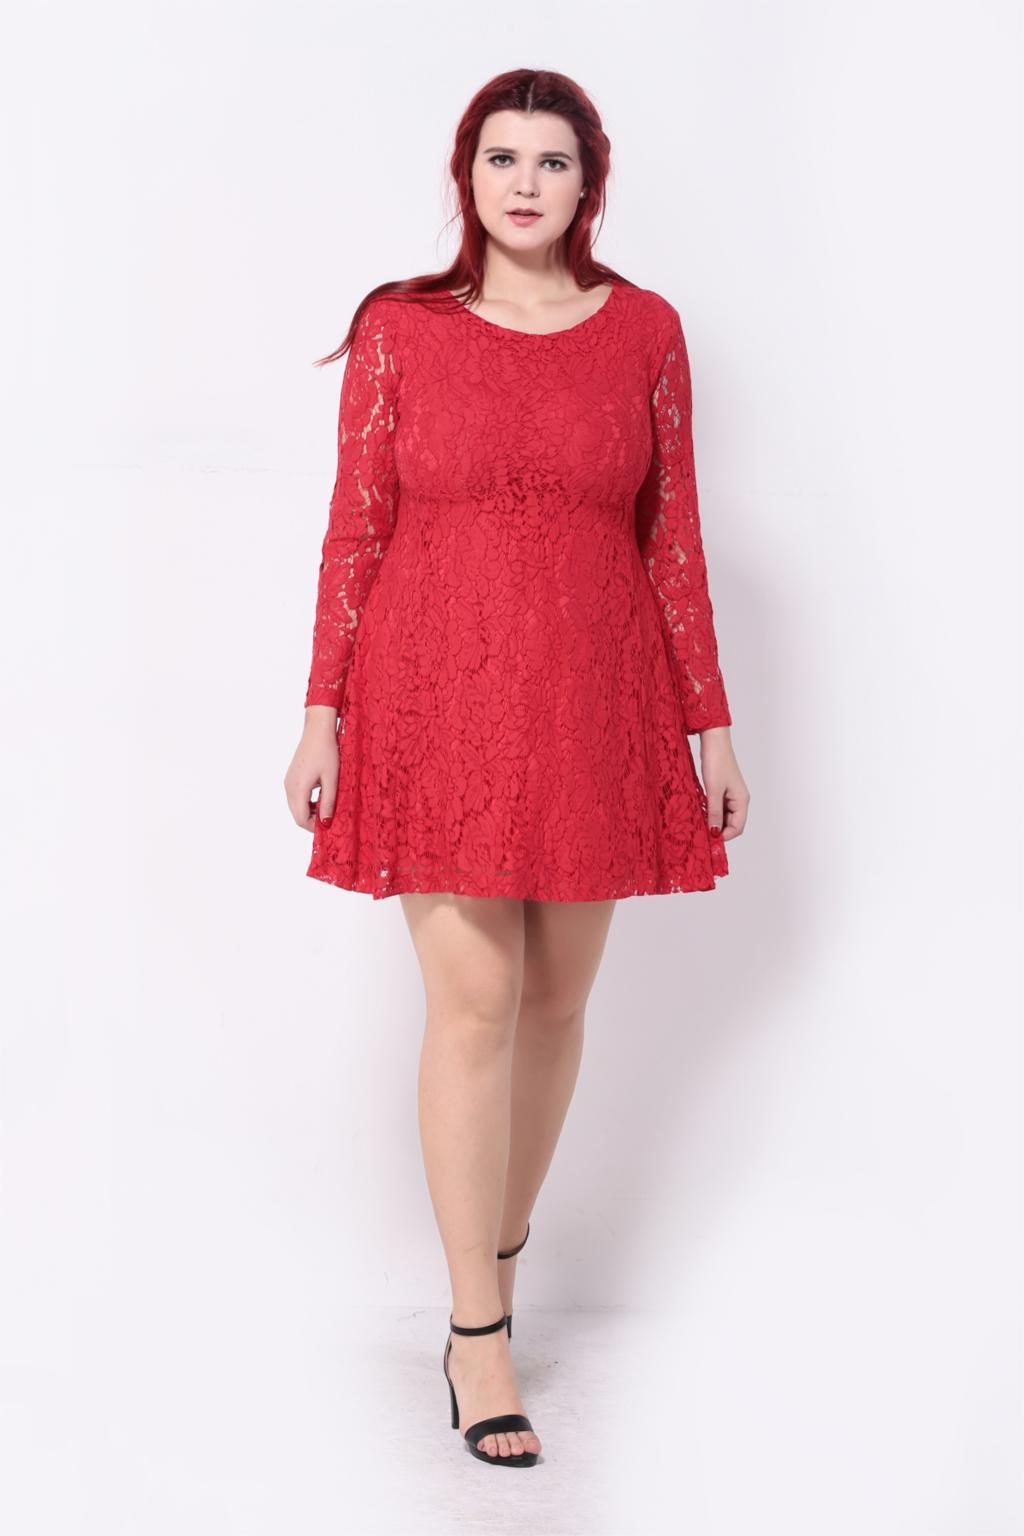 Vintage Premium Crochet Floral Lace Skater Dress Elegant Long Sleeve ... c314bd7f6937